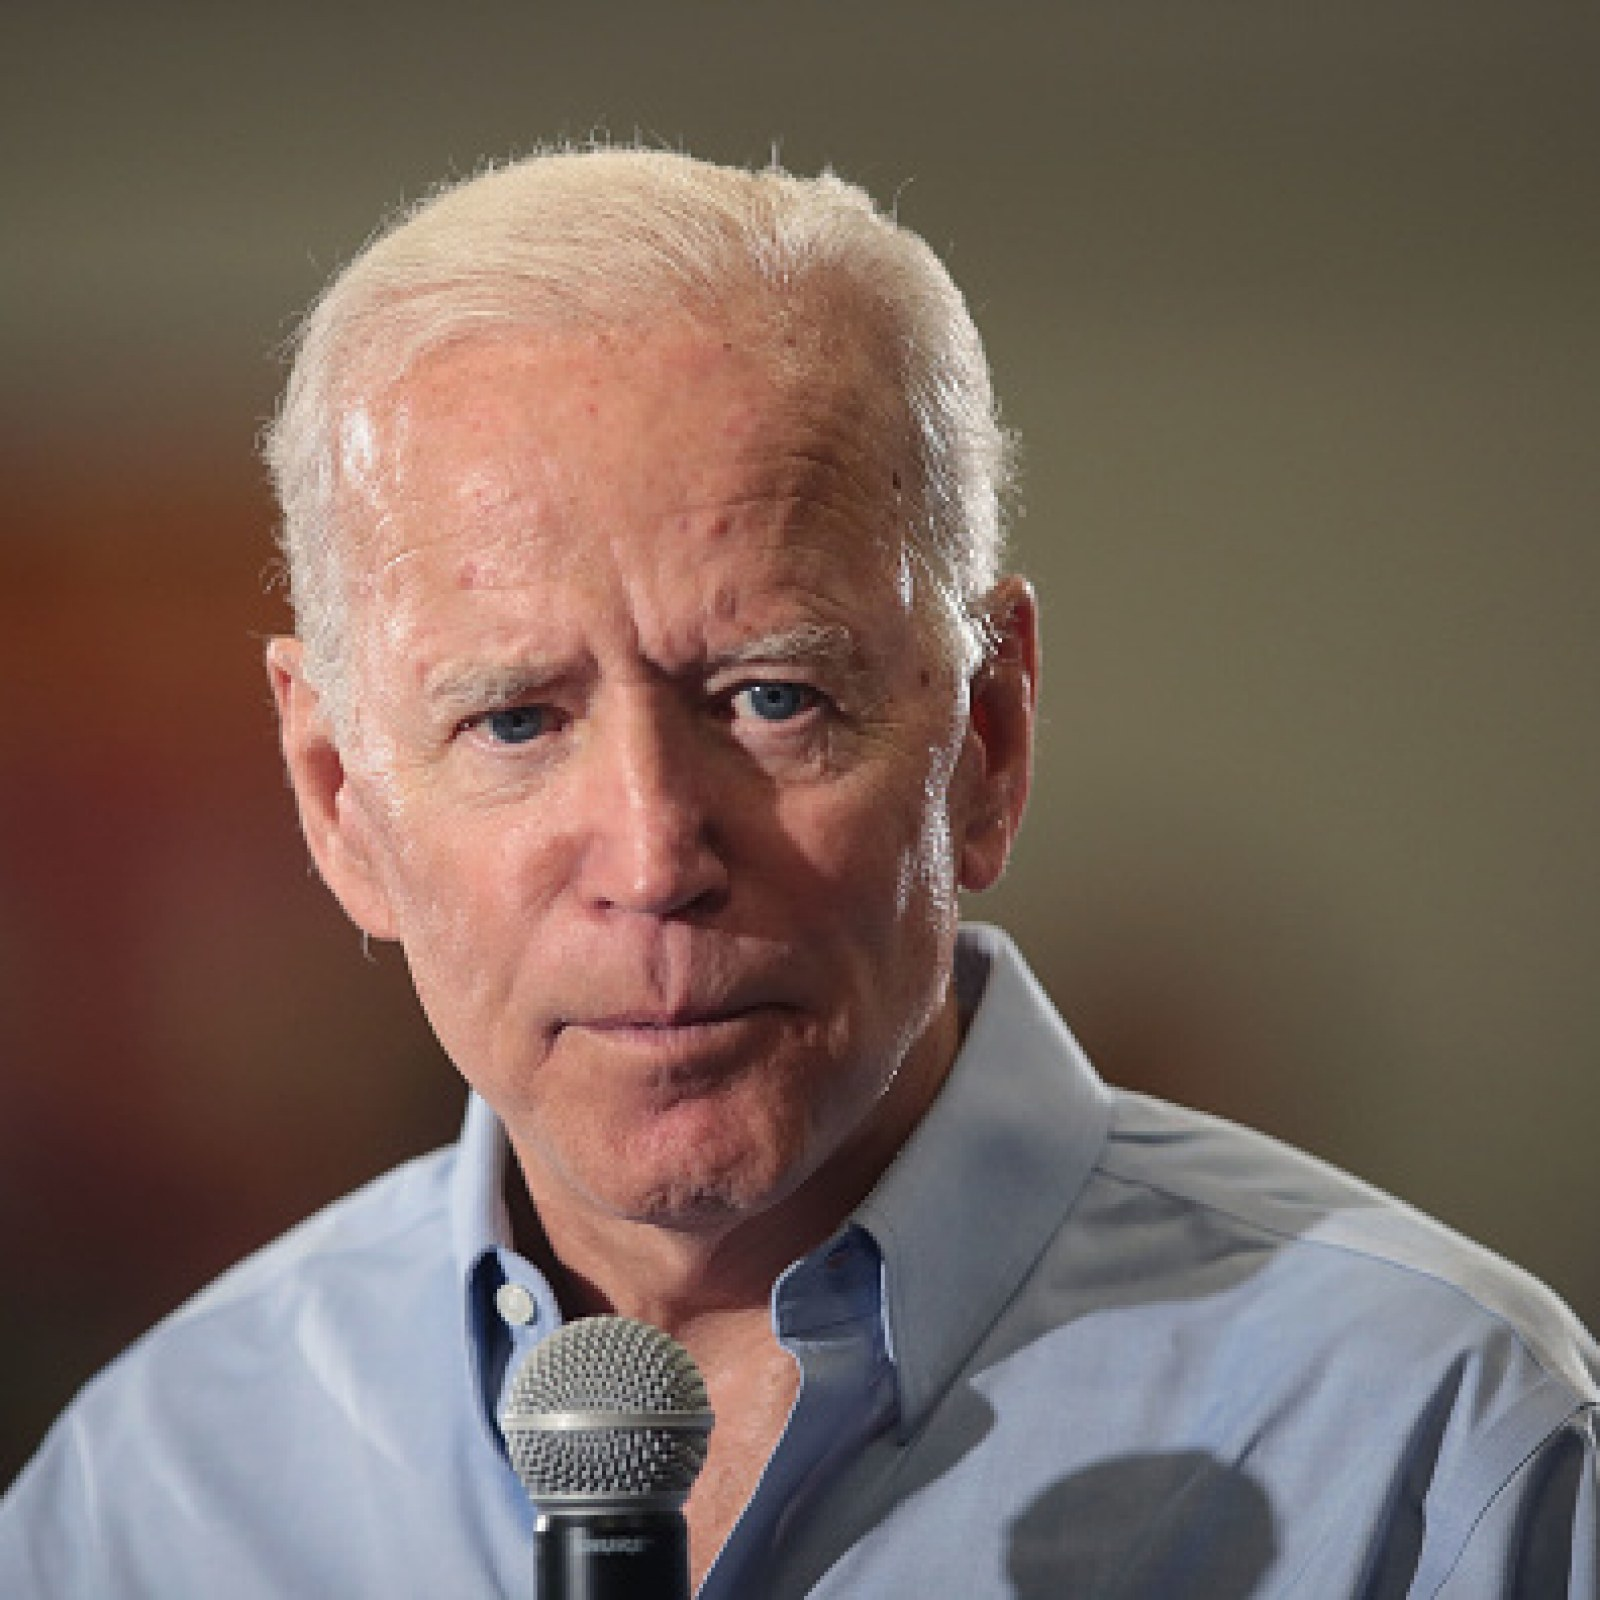 Joe Biden Tells Wealthy Fundraiser Crowd that 'Rich People Are Just